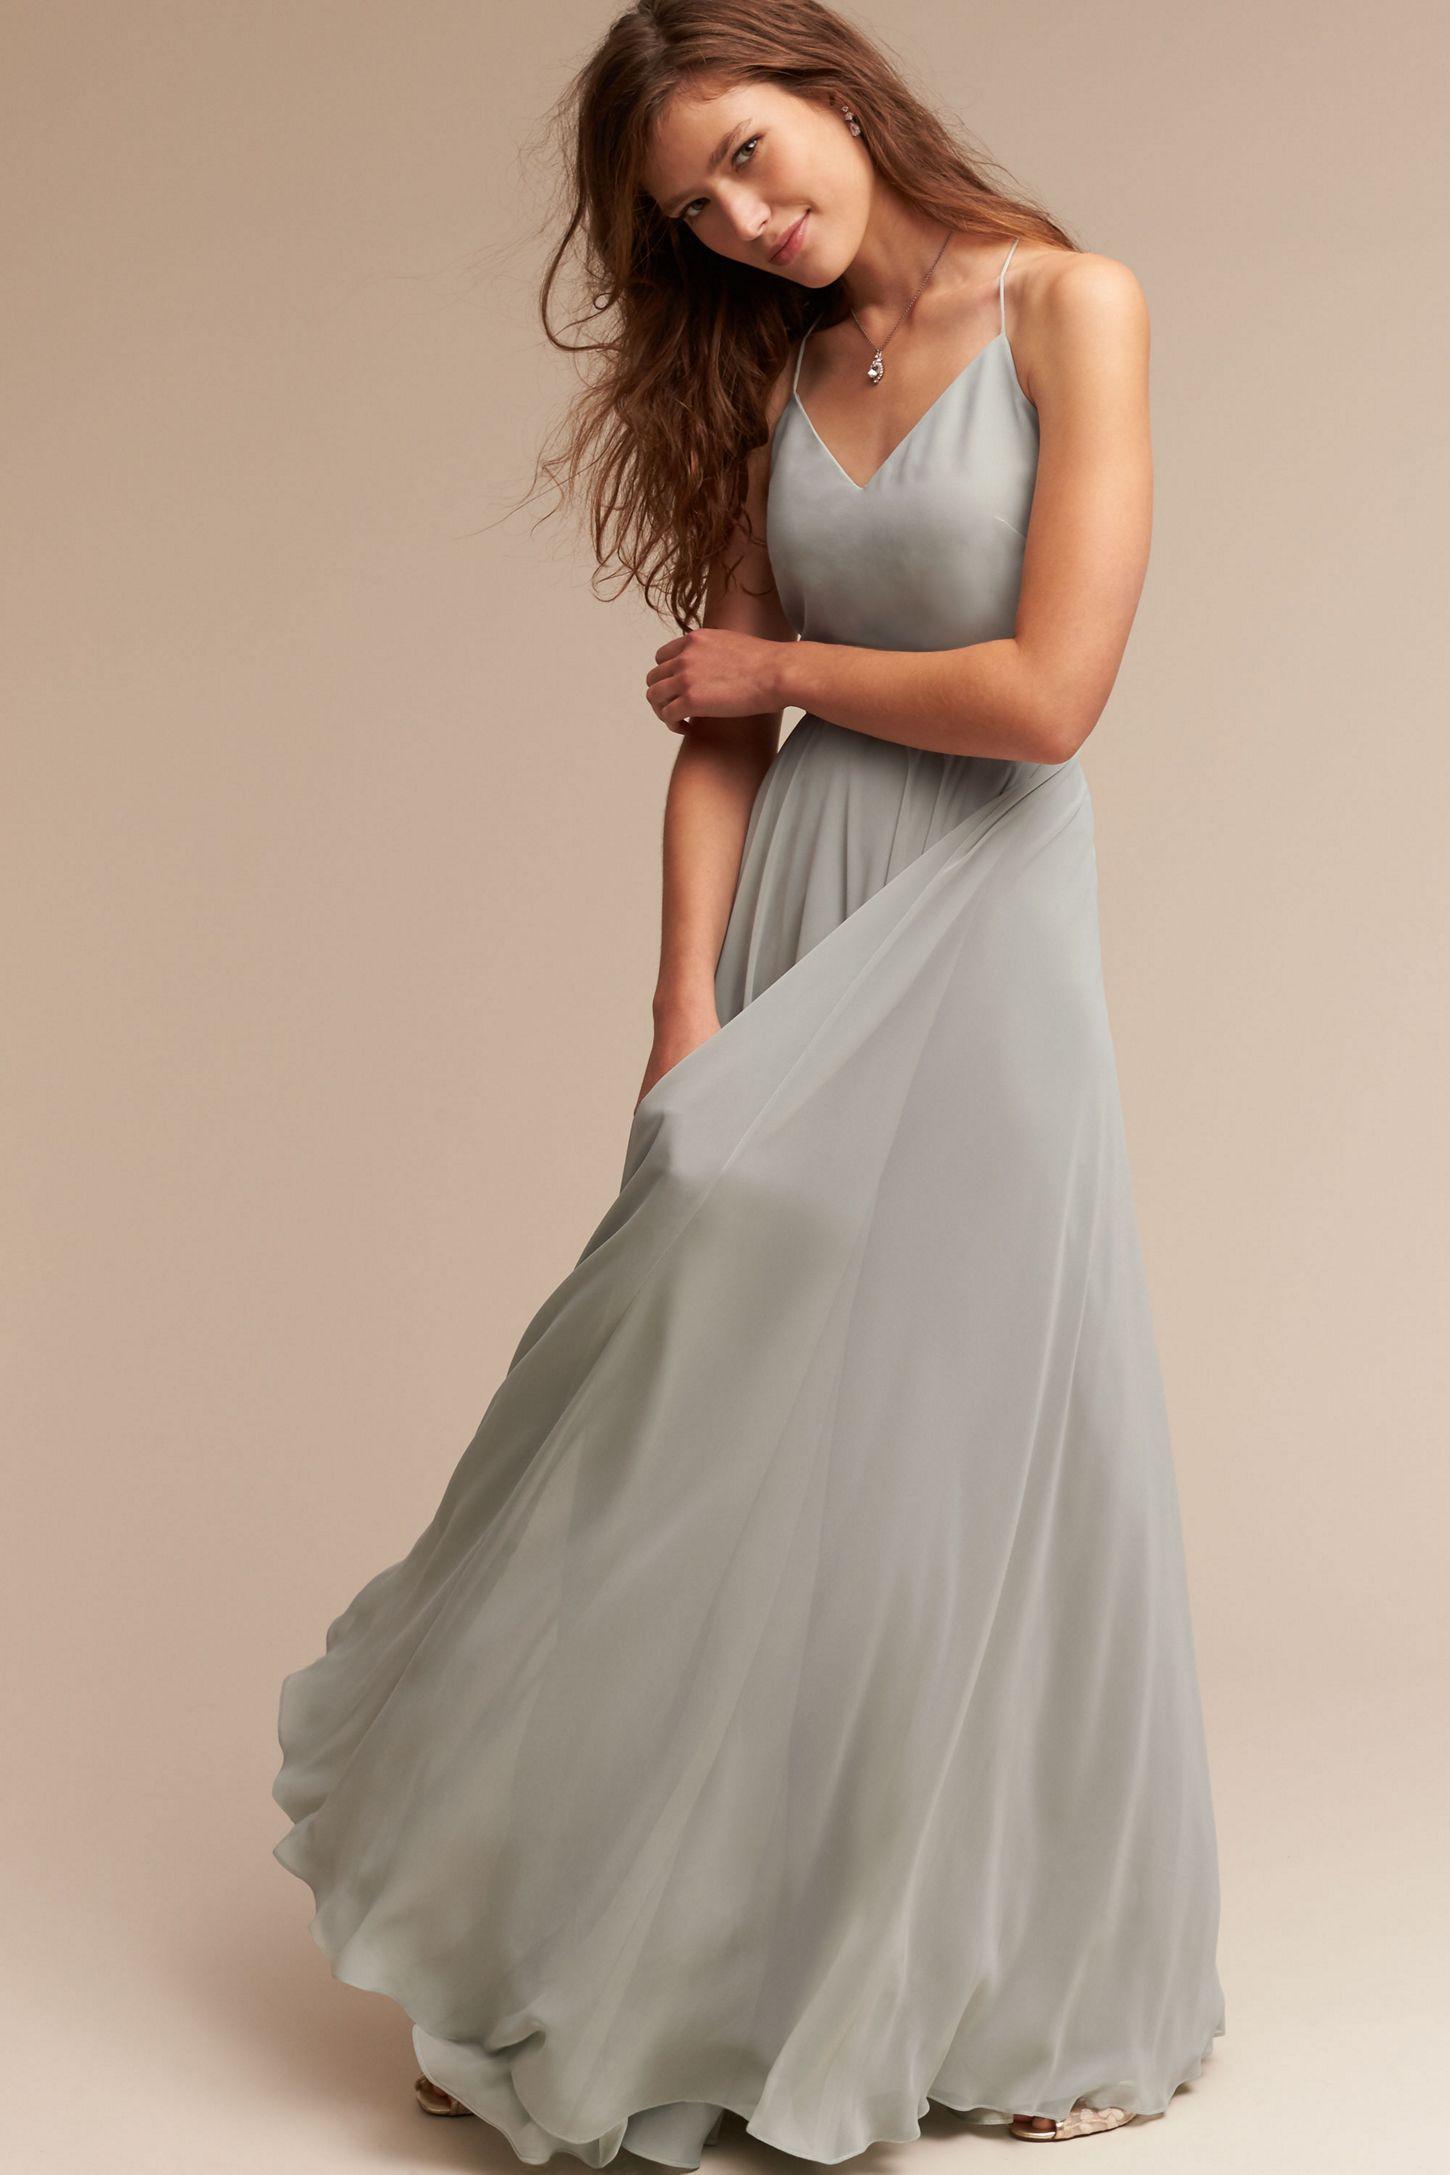 99671533c4f Slide View  4  Inesse Dress